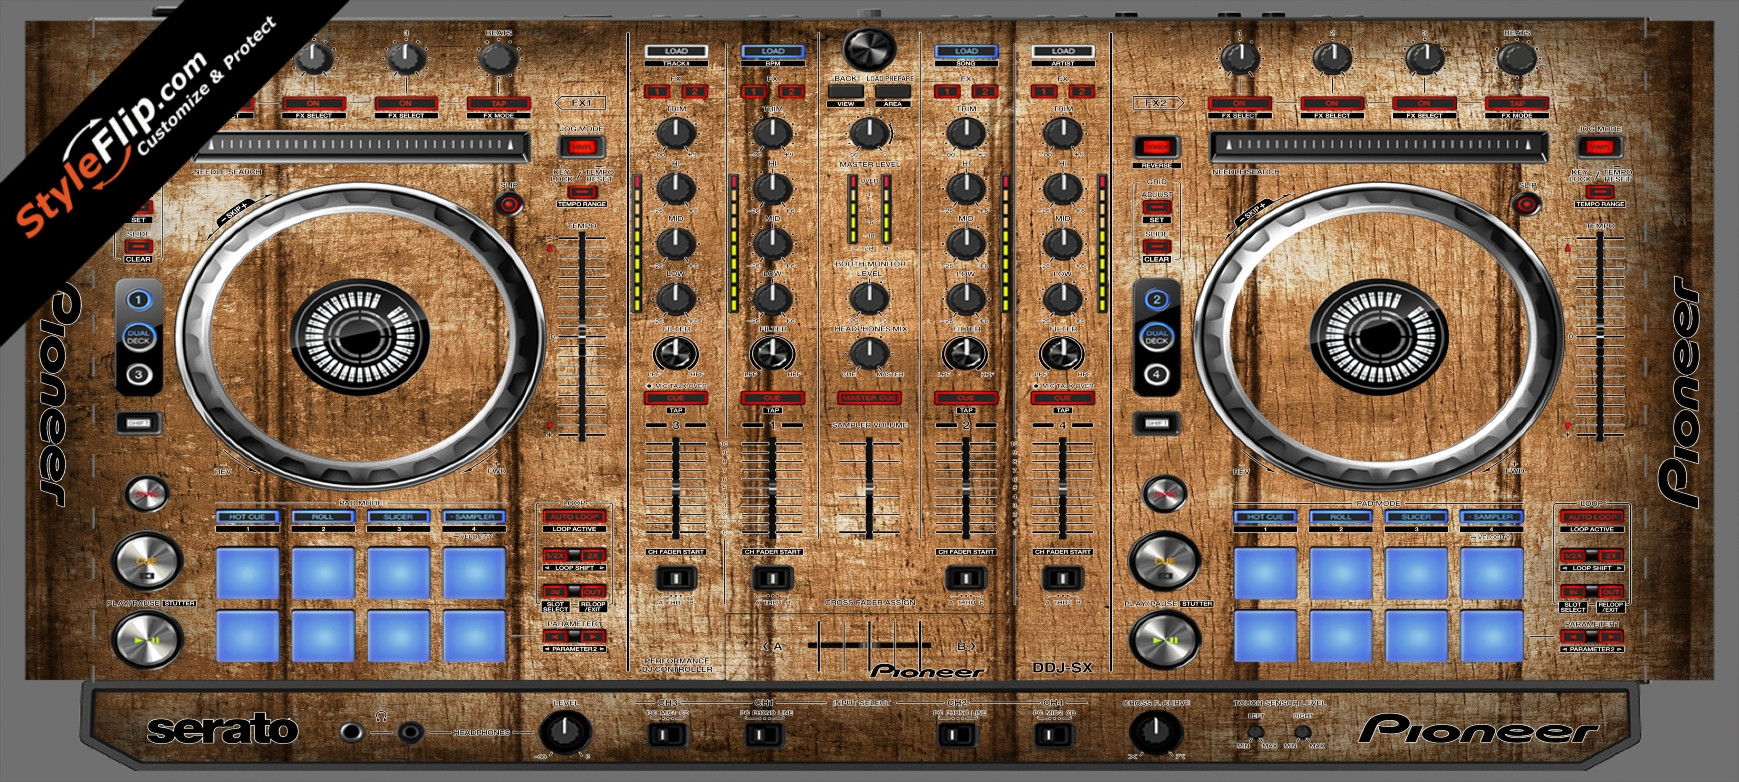 Wood Panels  Pioneer DDJ-SX